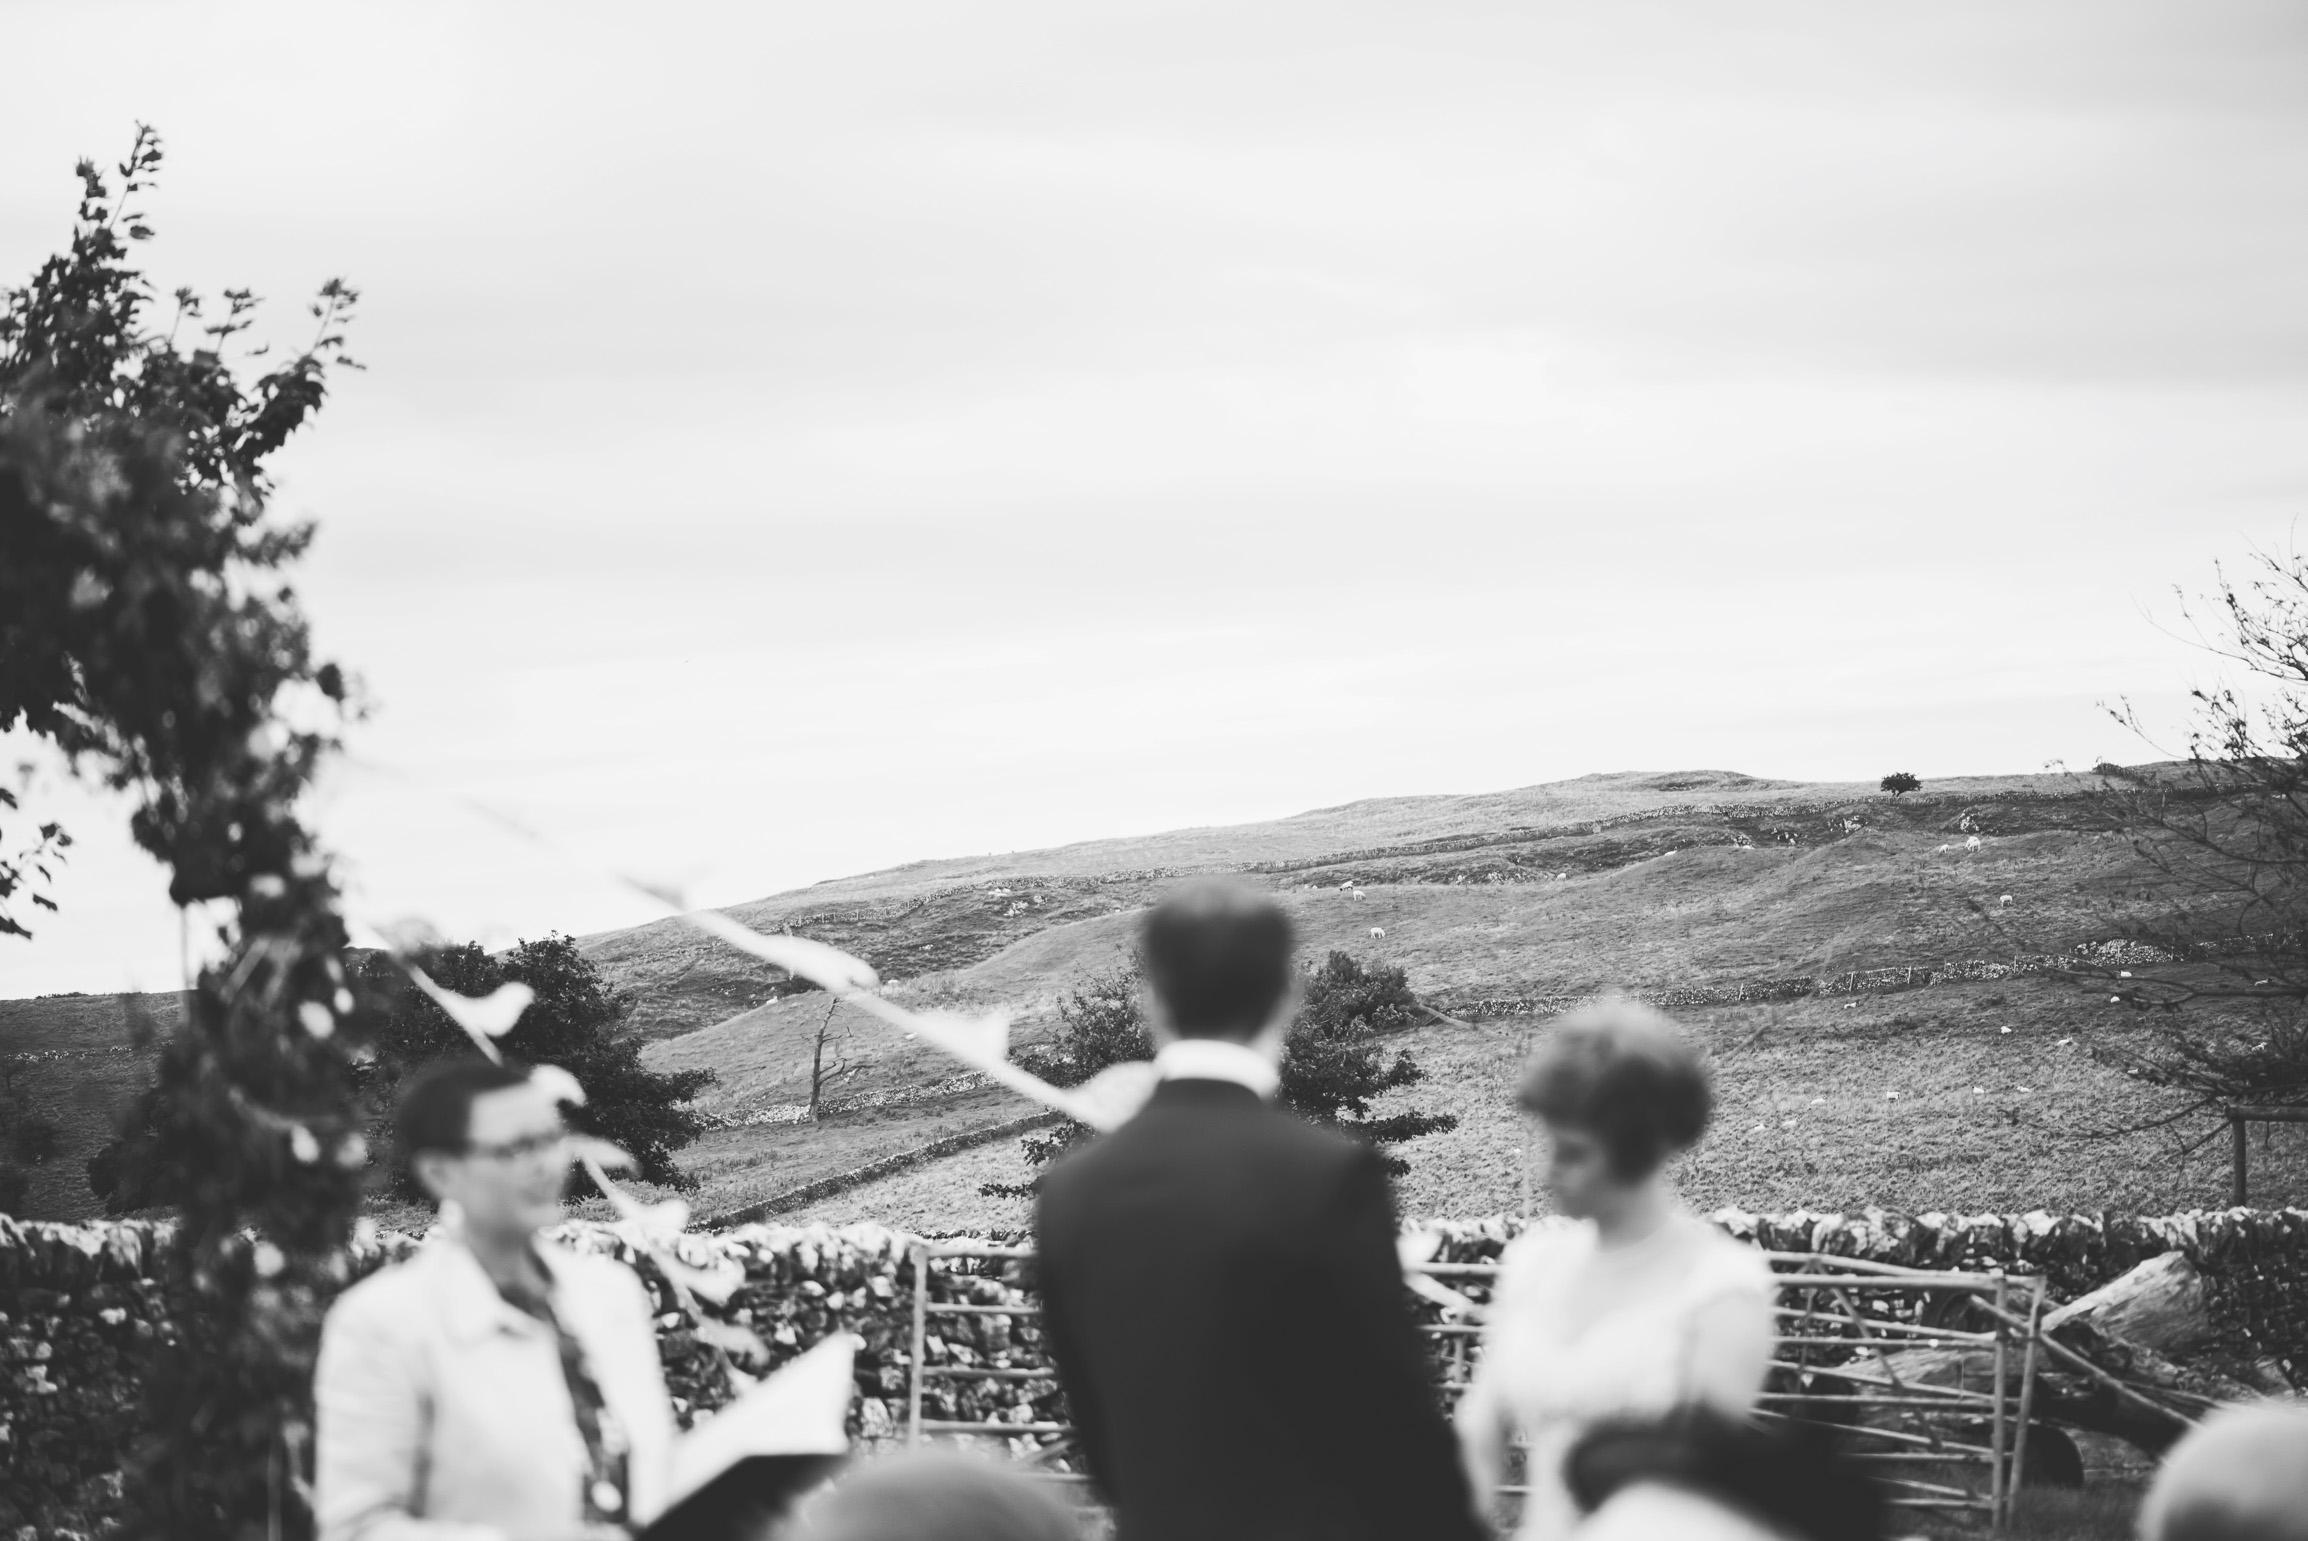 Peak+district+farm+wedding+lower+damgate+photographer-130.jpg